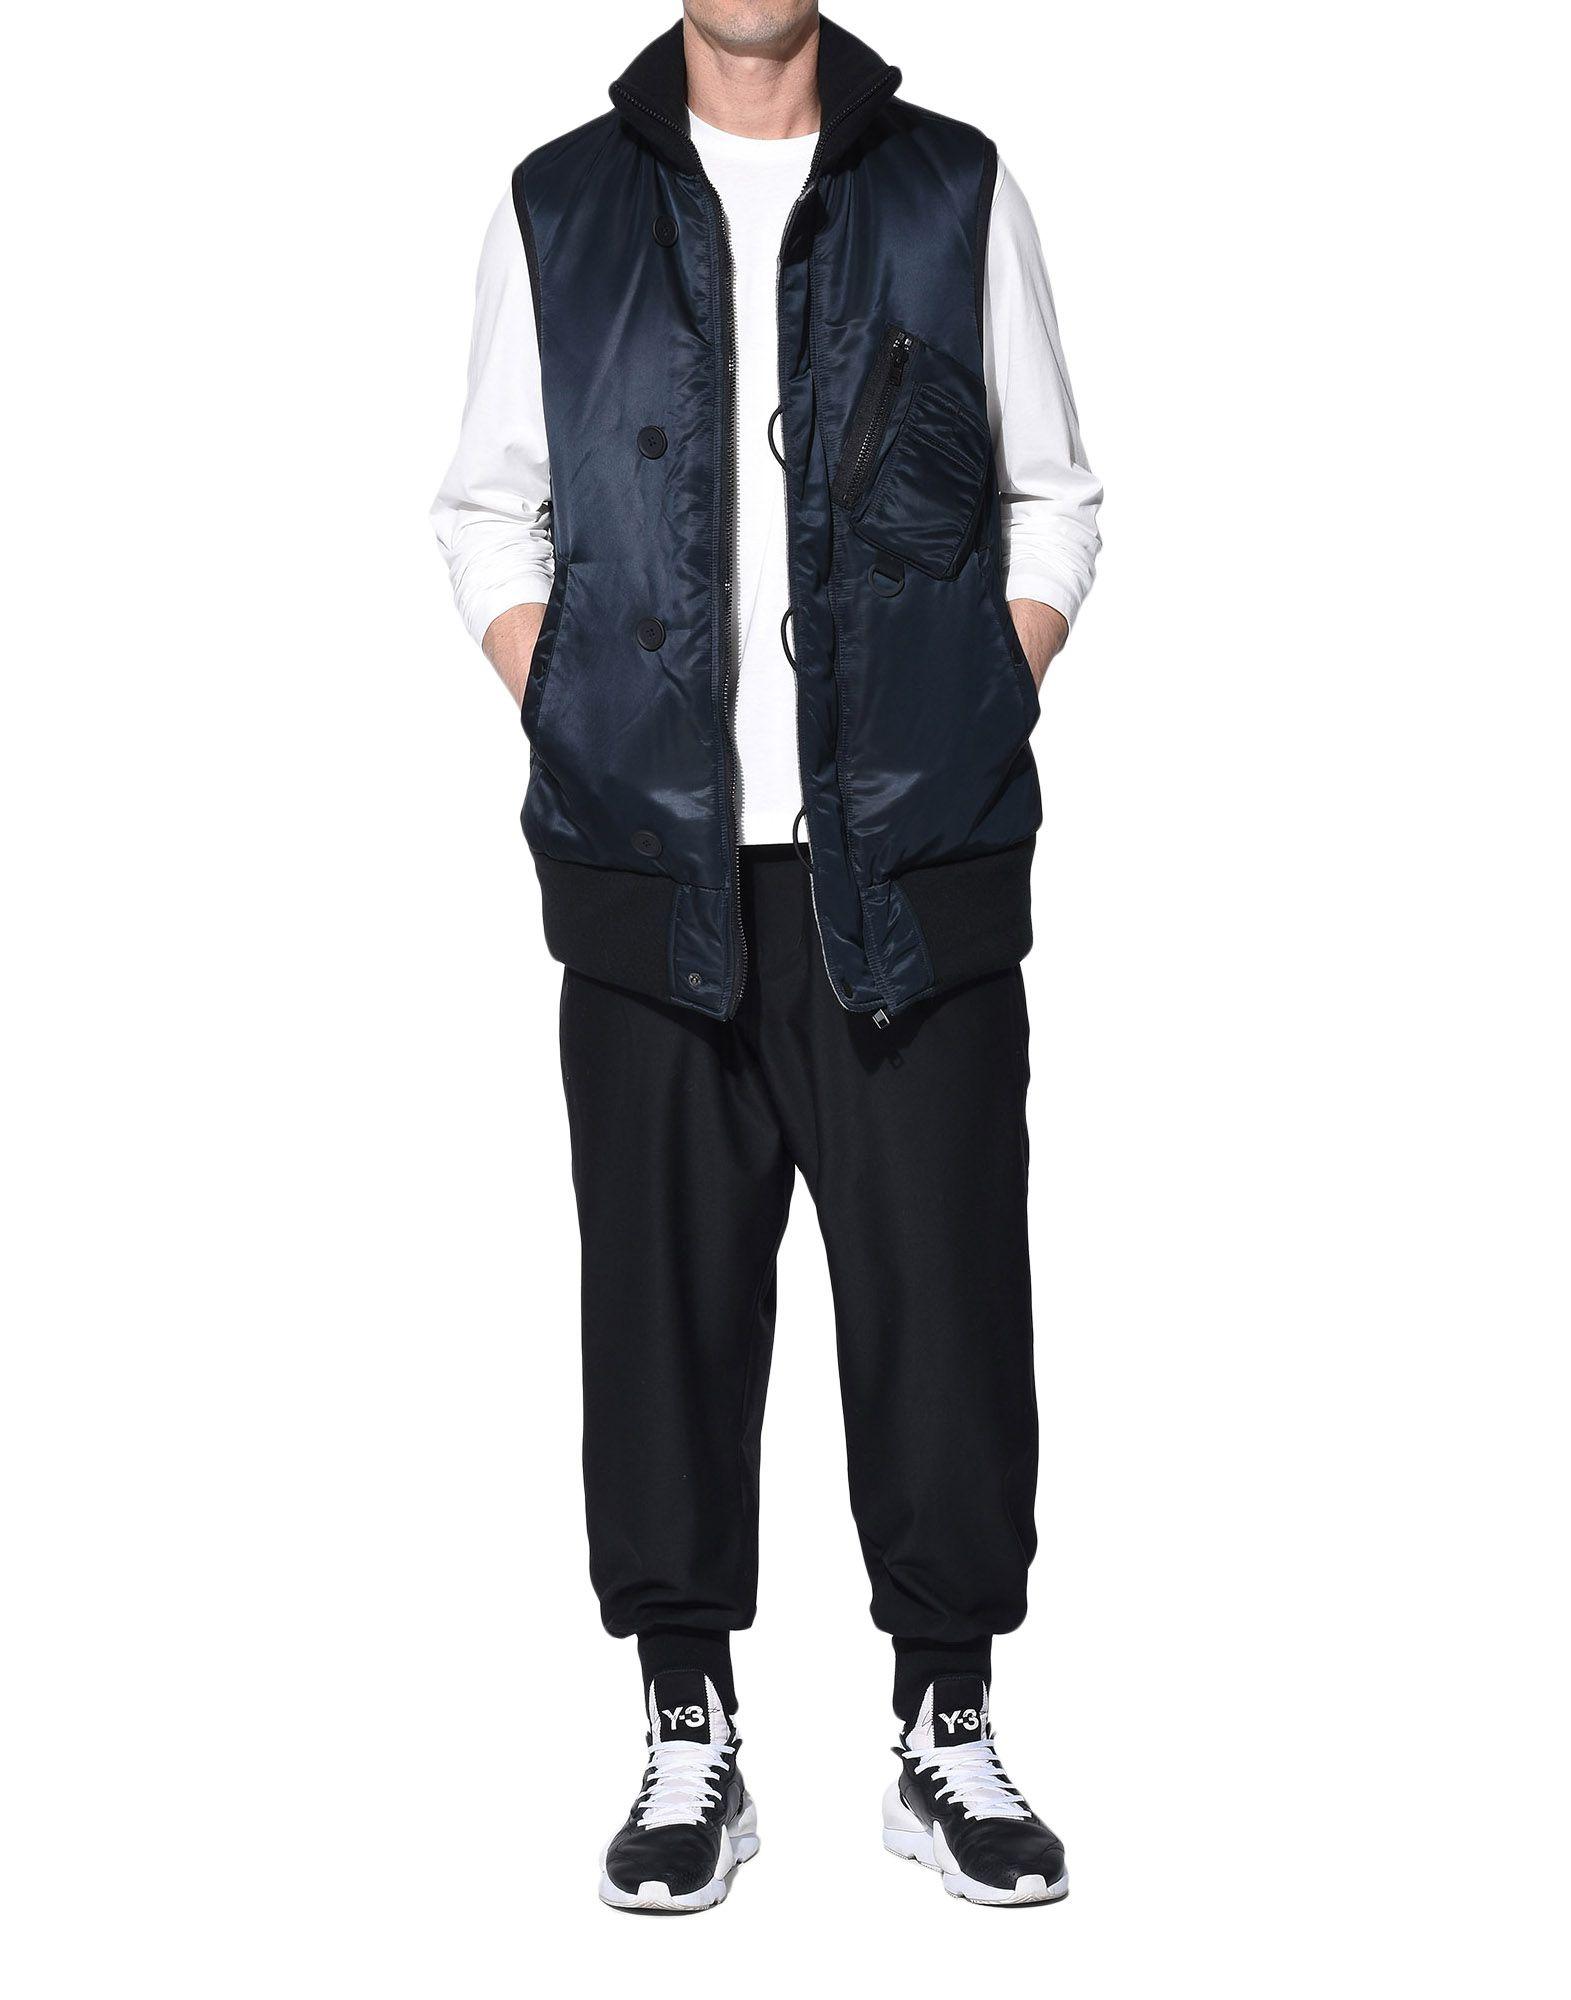 Y-3 Y-3 Oversize Reversible Vest ベスト メンズ a